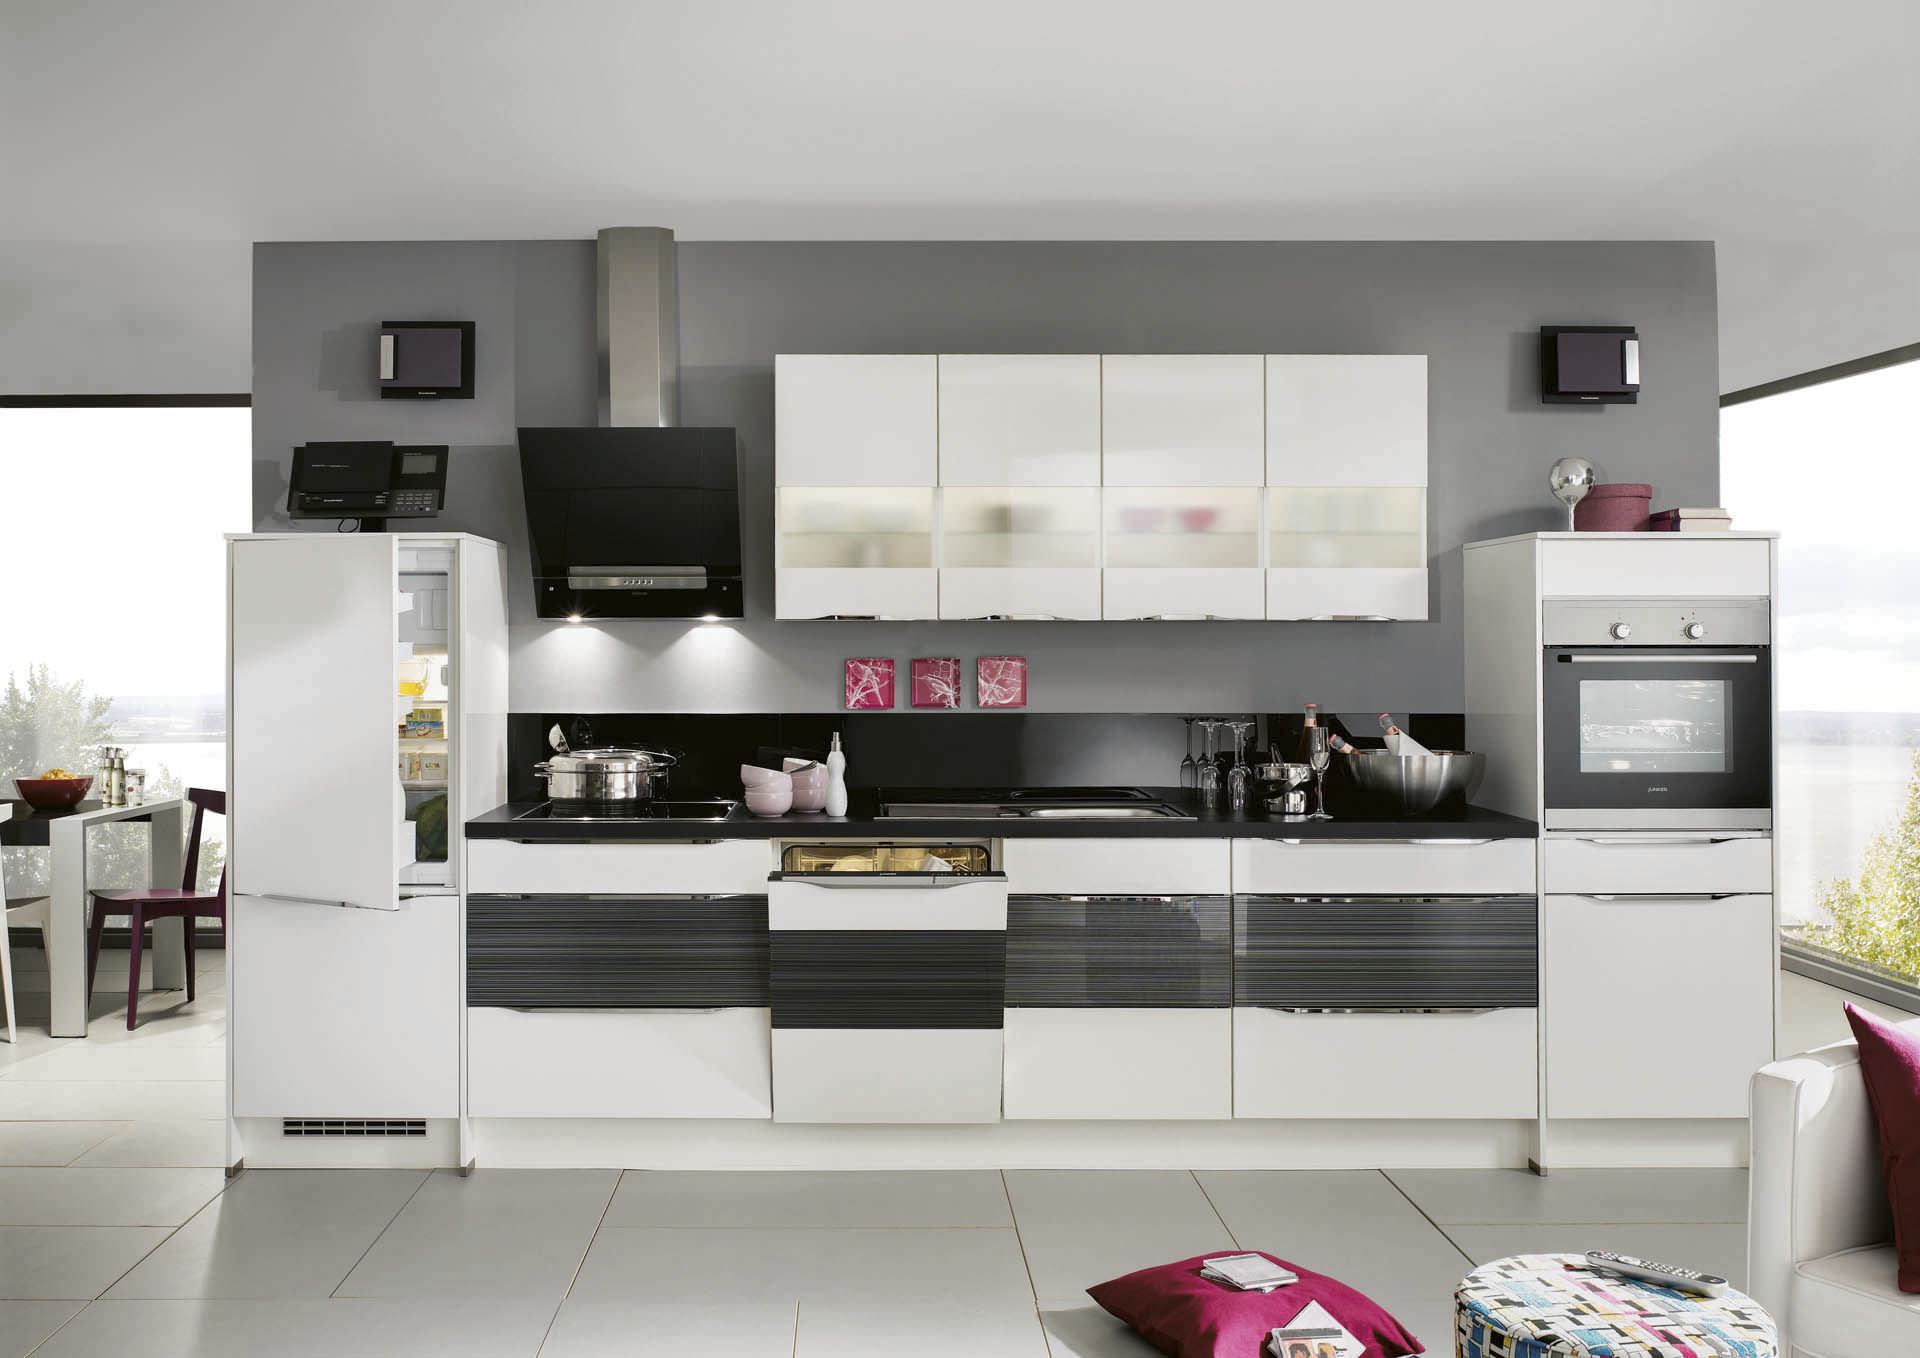 Moderne Küche / Holz / lackiert / Hochglanz - HIGHLIGHT 785 - nobilia | {Nobilia küchen weiss hochglanz 24}